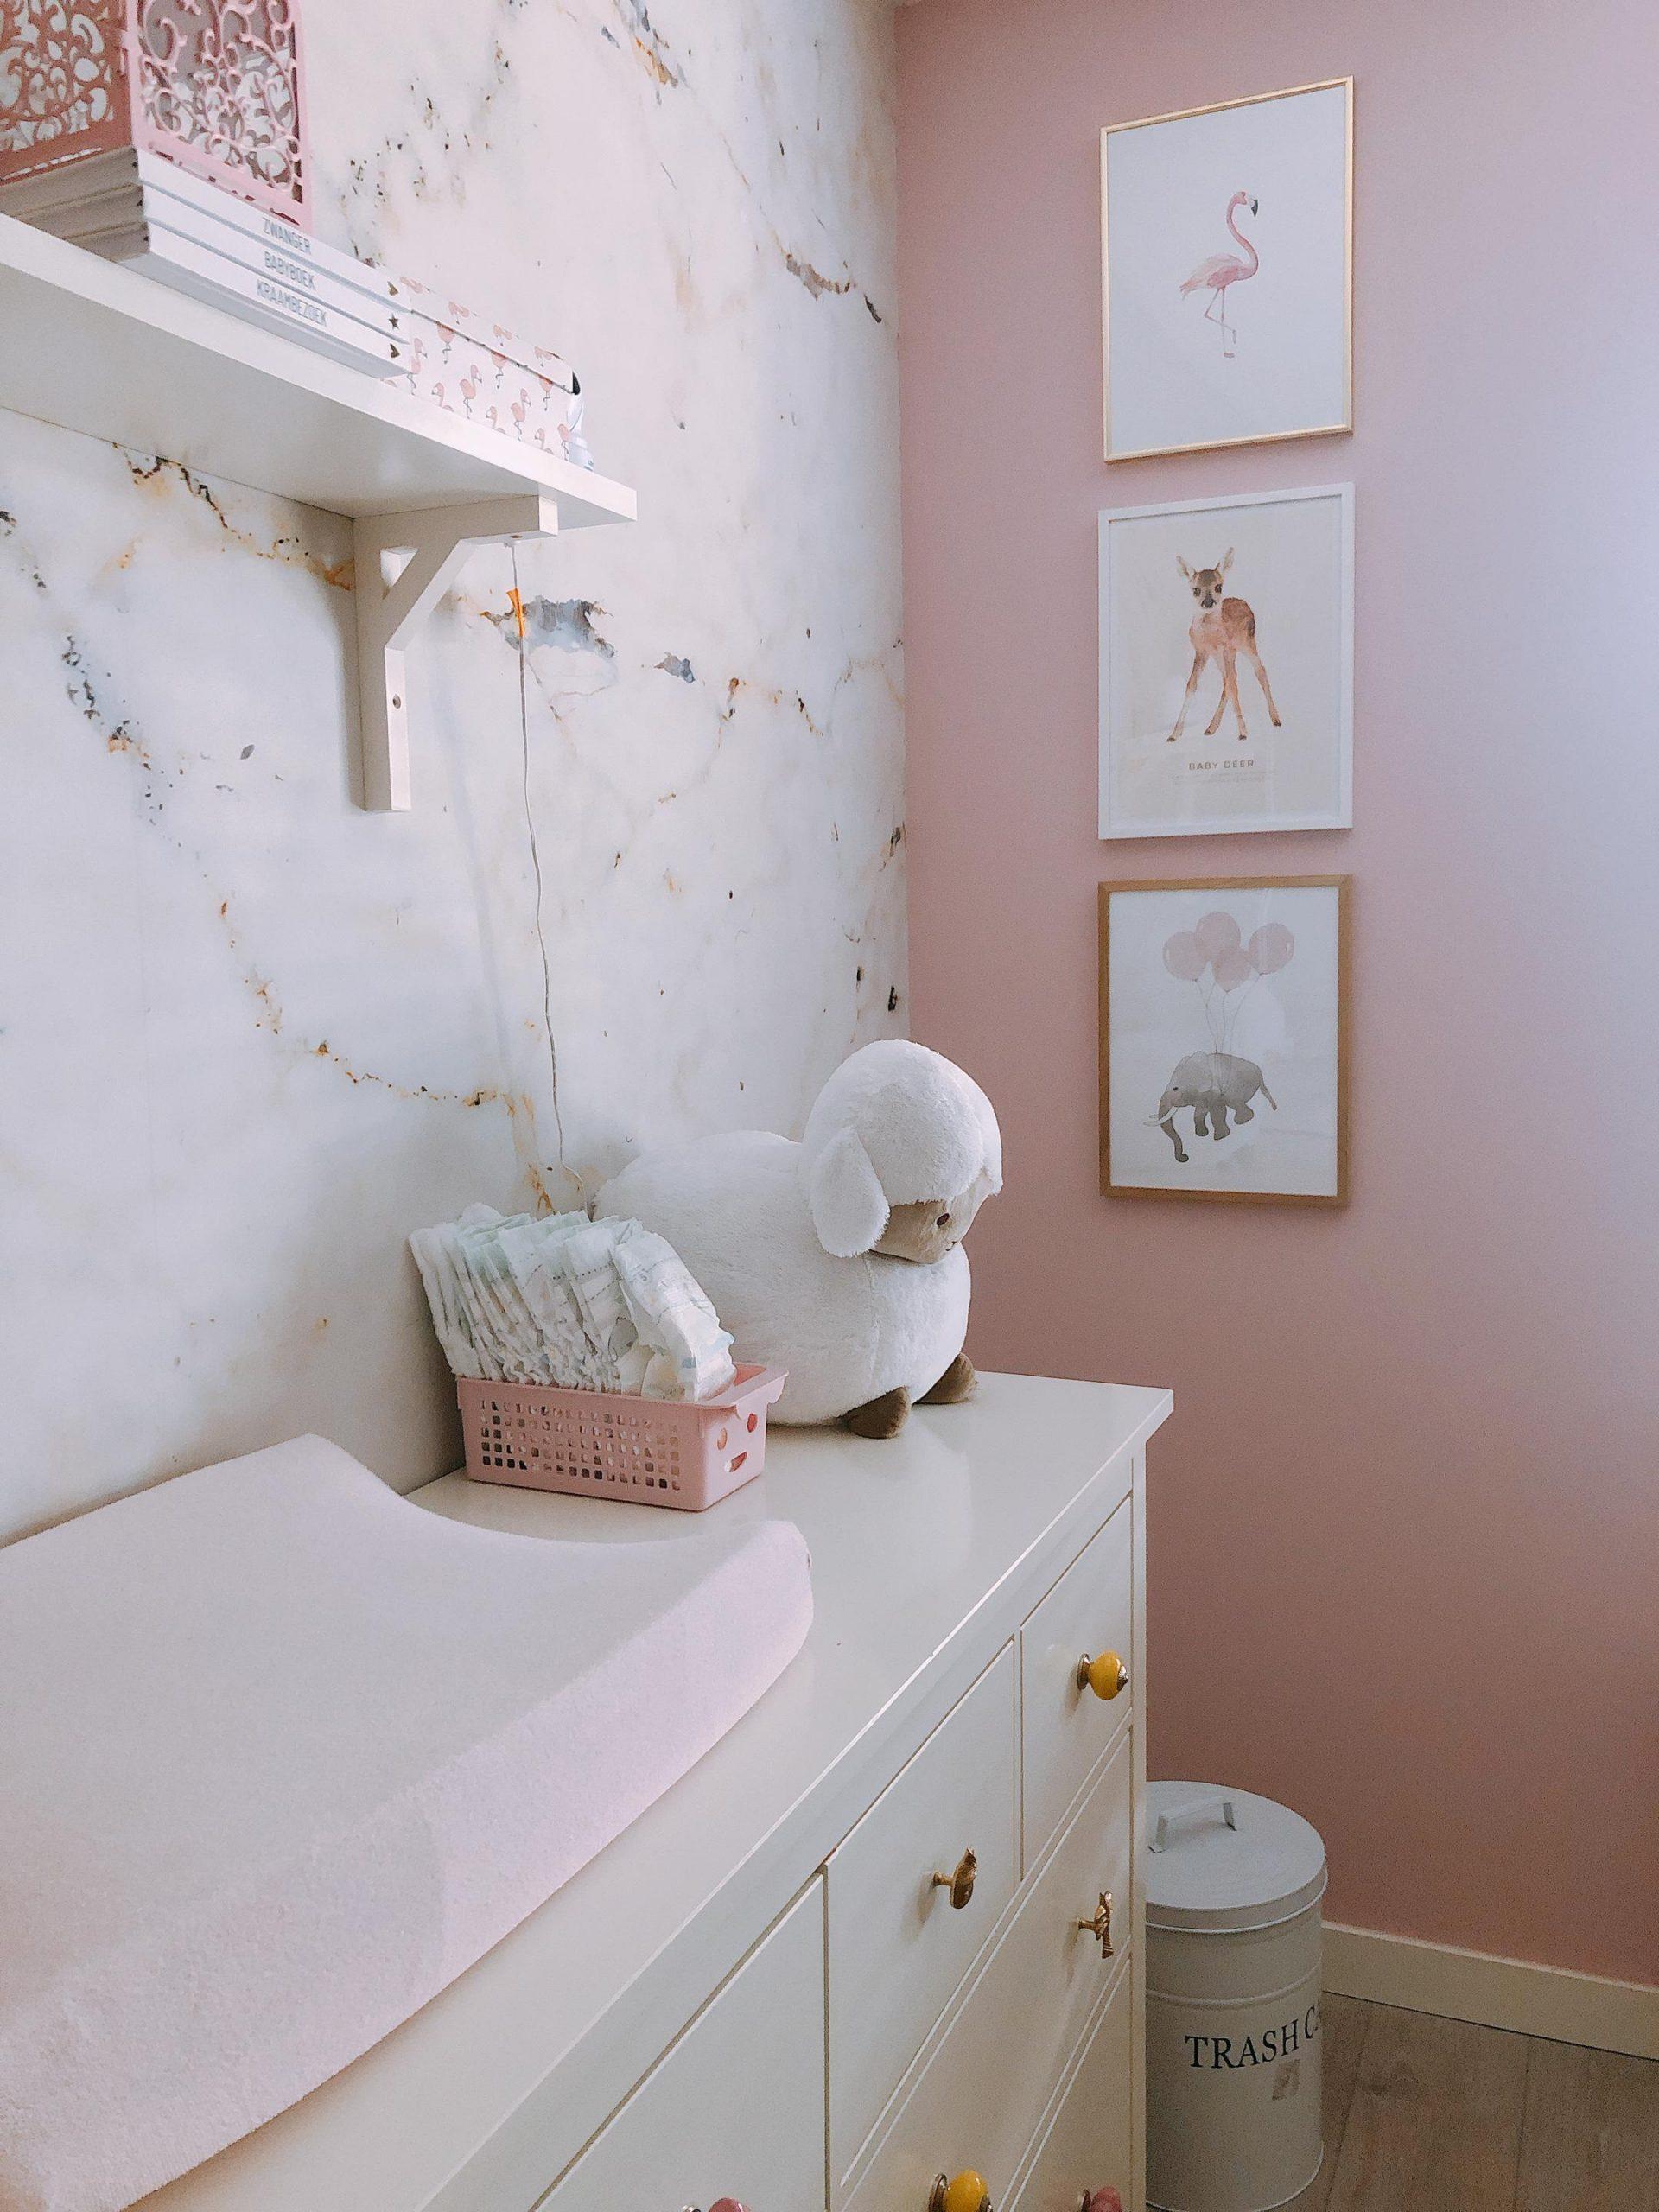 IMG 6931 2160x2880 1 scaled - De baby/kinderkamer van Hazel - roze, hout & marmer!